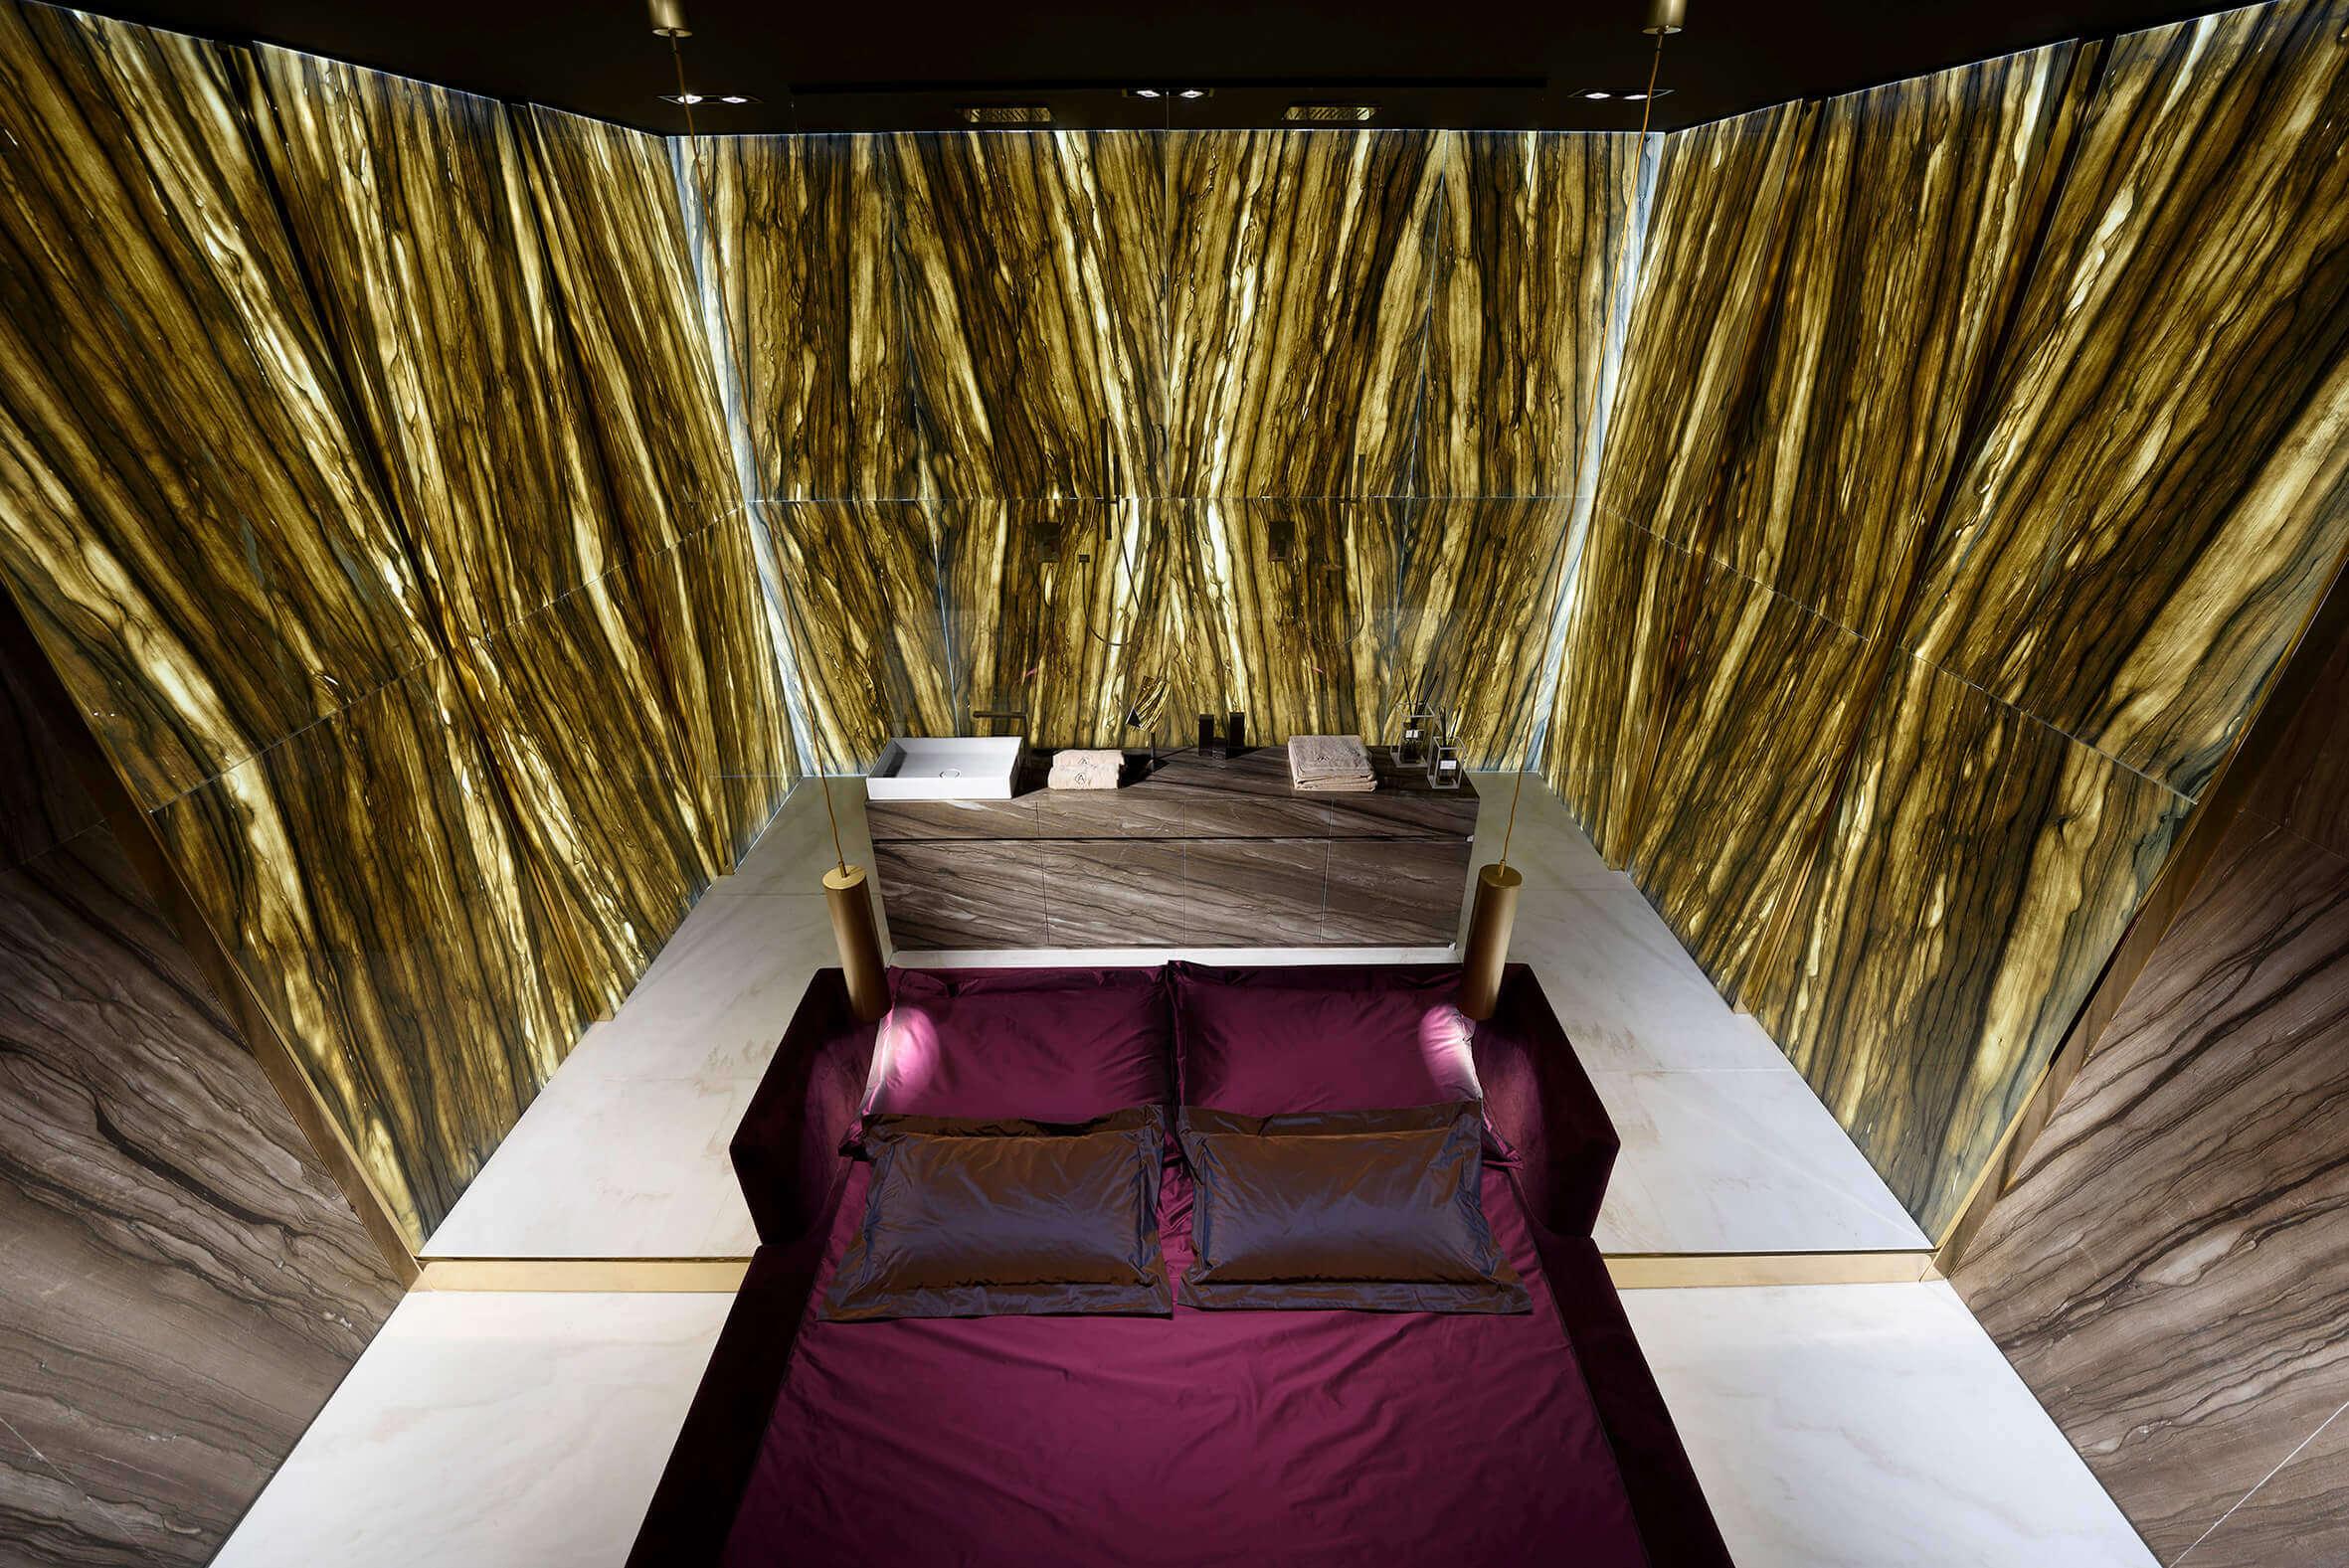 Moderne Schlafzimmer Trends 2019 Der Fruhling Ist Da